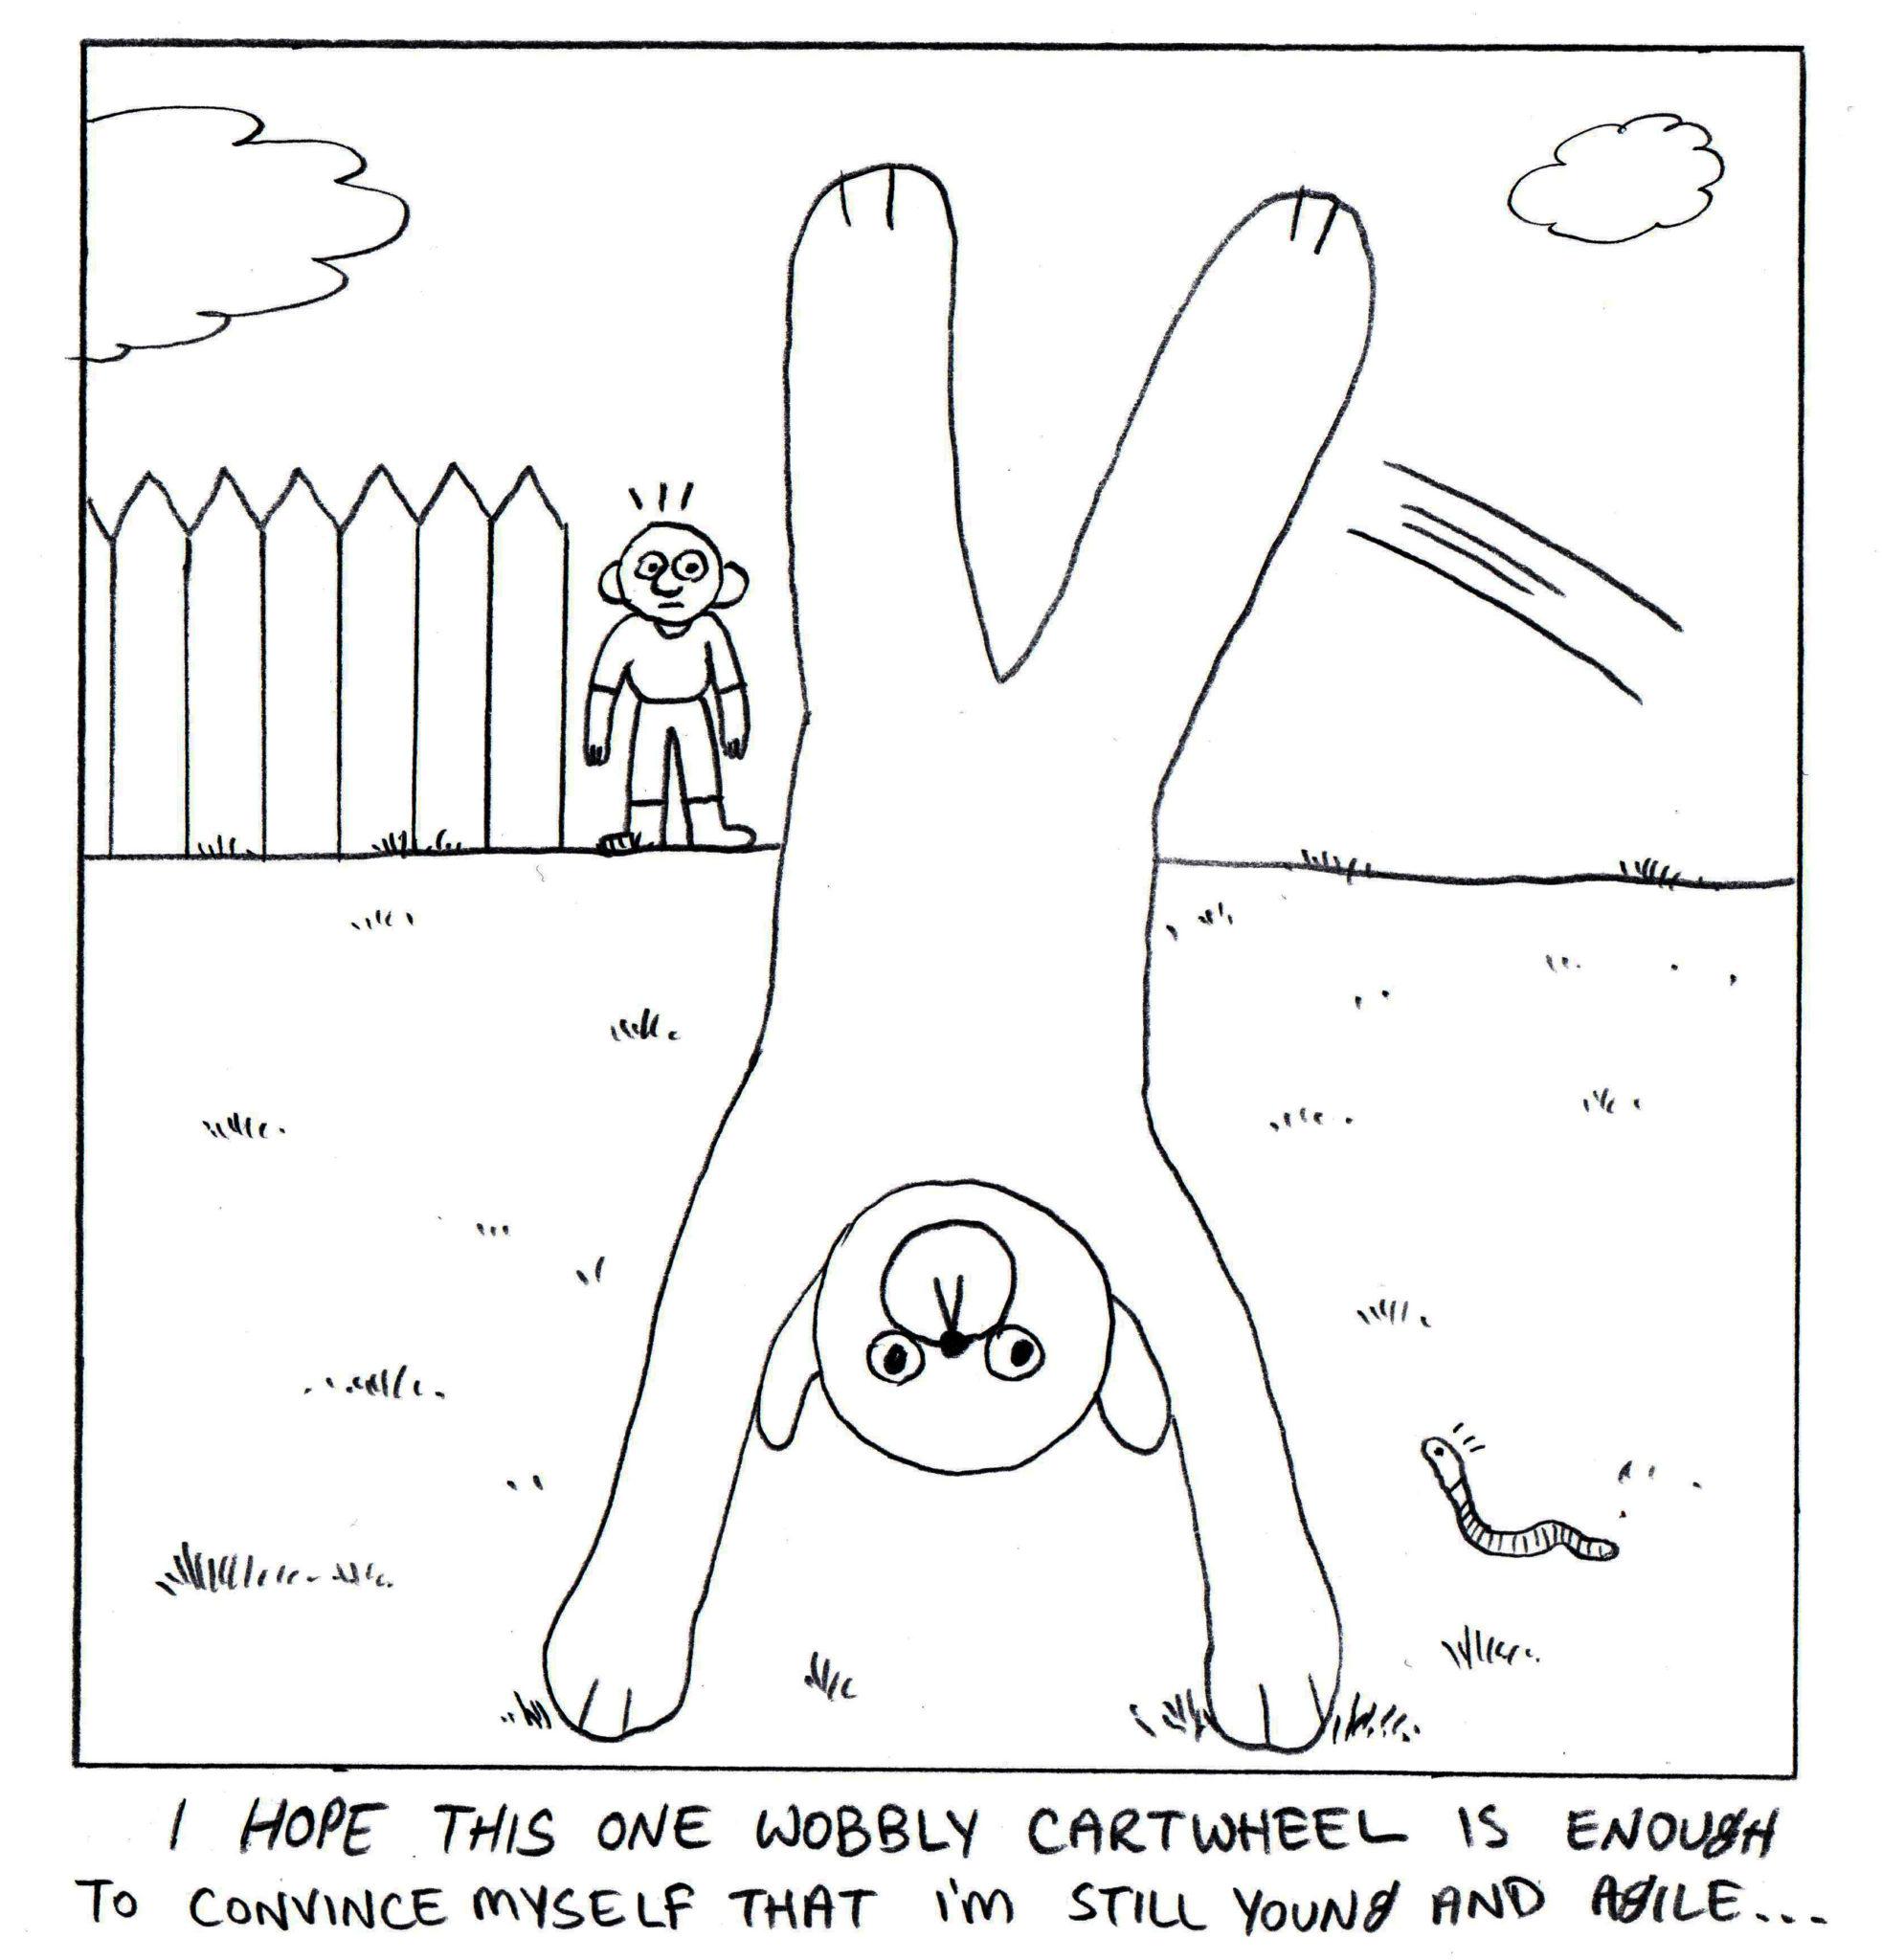 Dog Comics 191-195 - Page 1